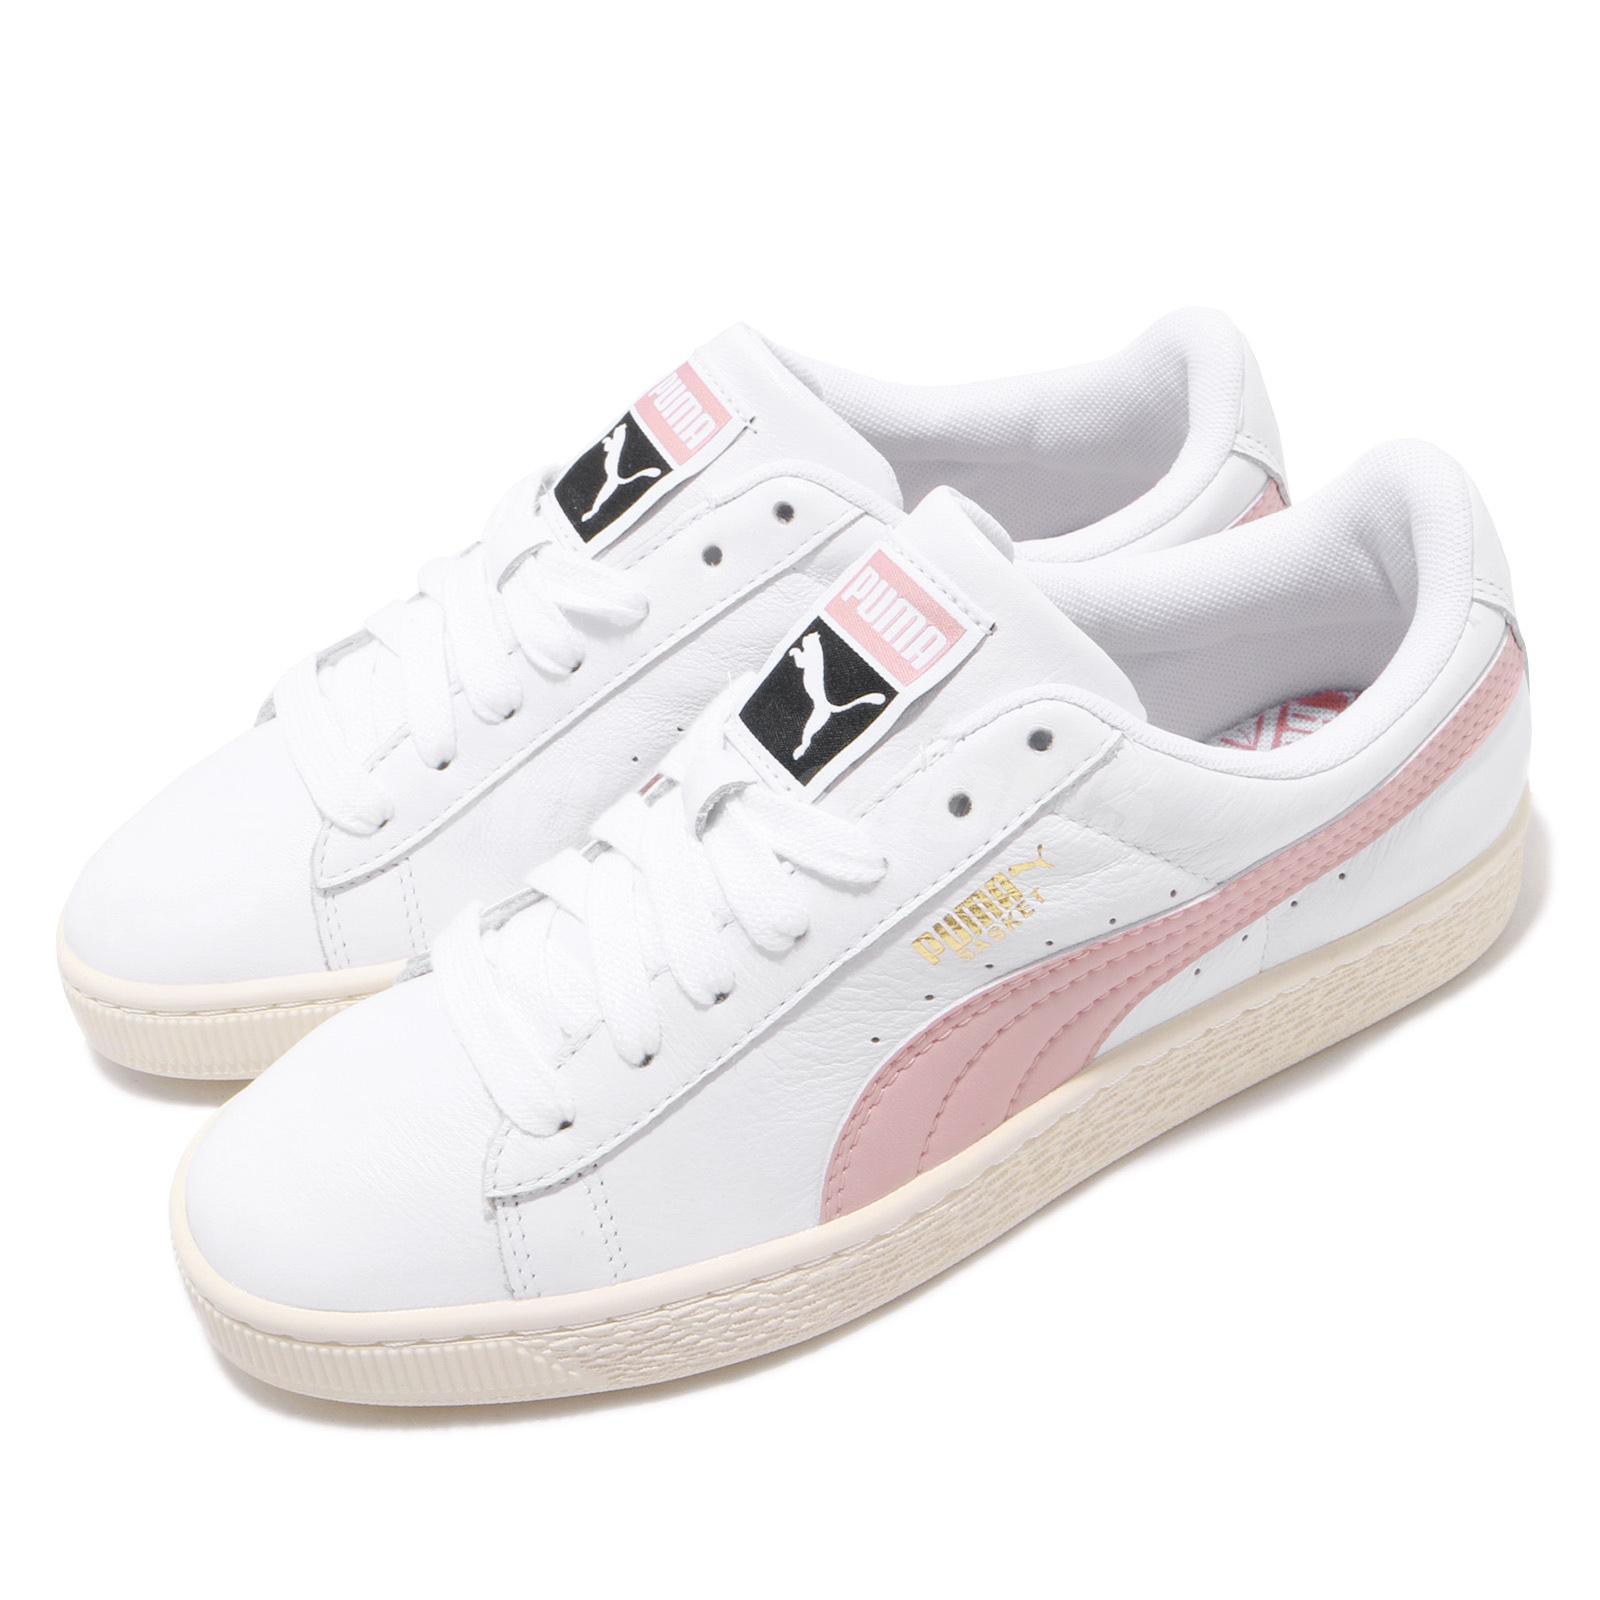 Habitat contacto enaguas  Puma Basket Classic LFS White Bridal Rose Men Casual Shoes Sneakers  354367-35 | eBay